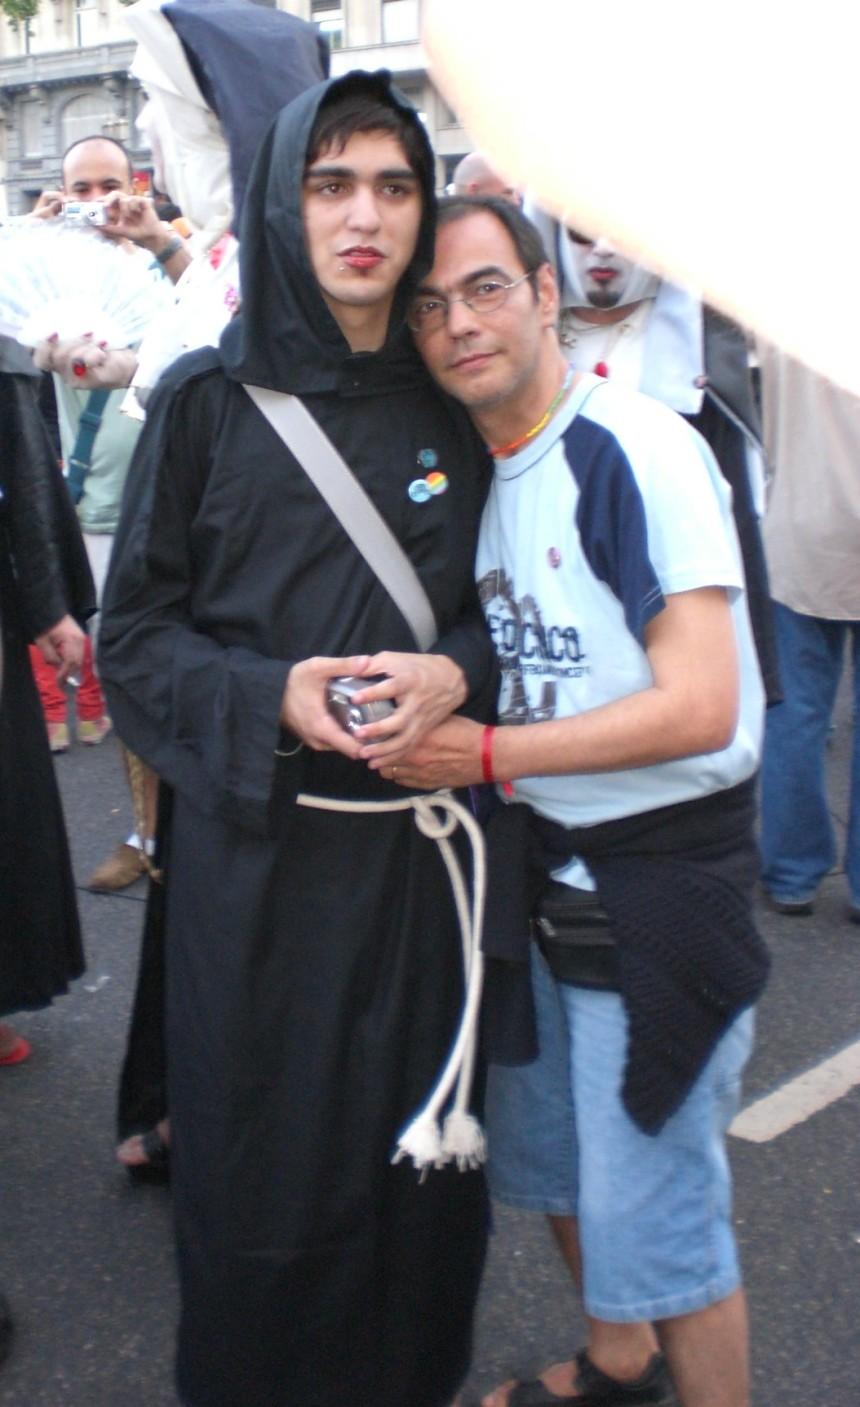 pride 2007 - couple not naughty